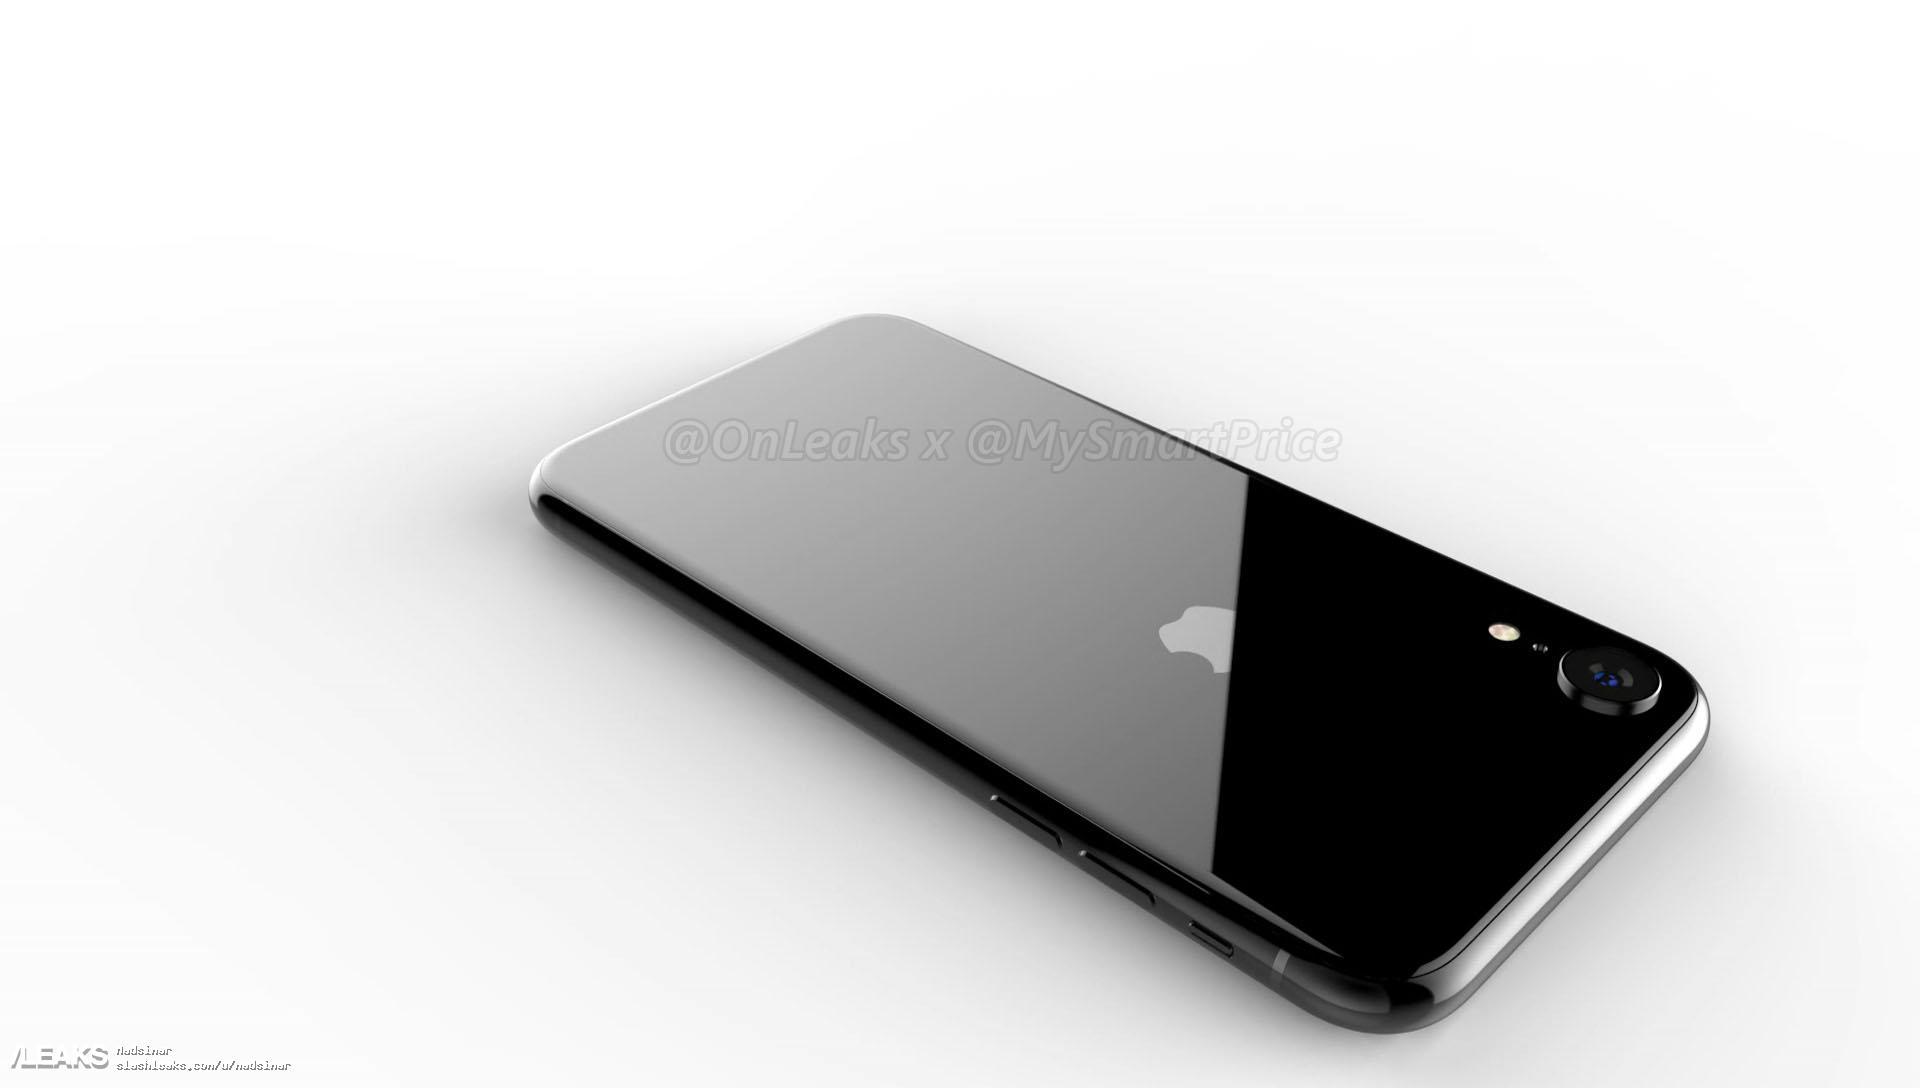 iphone-6-1-010_nb3ebv.jpg